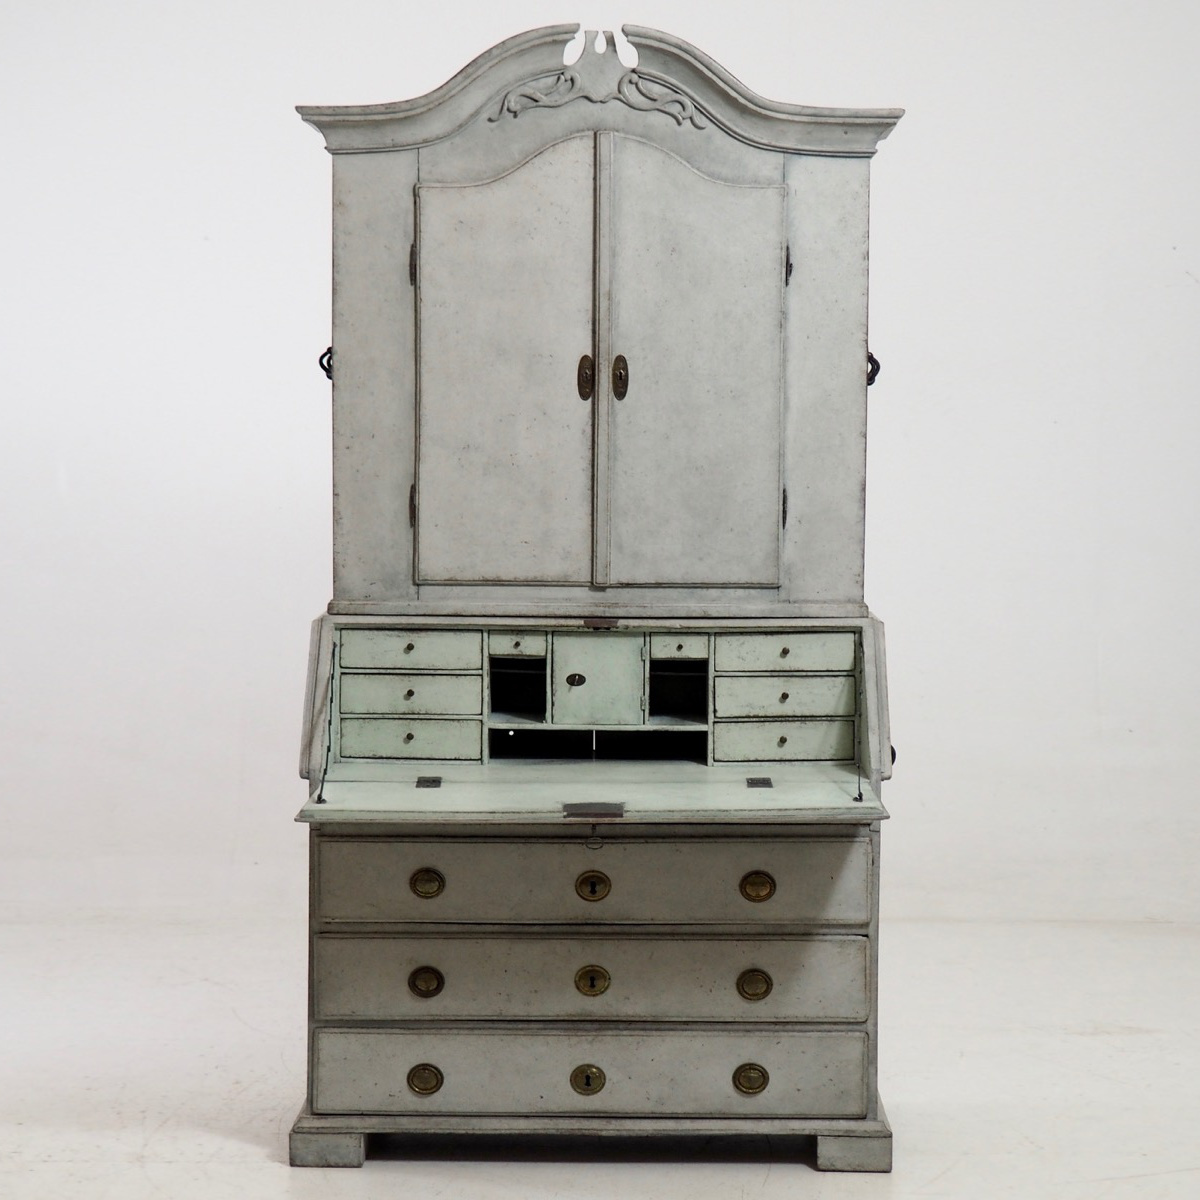 Cabinet0_srcset-large.jpg